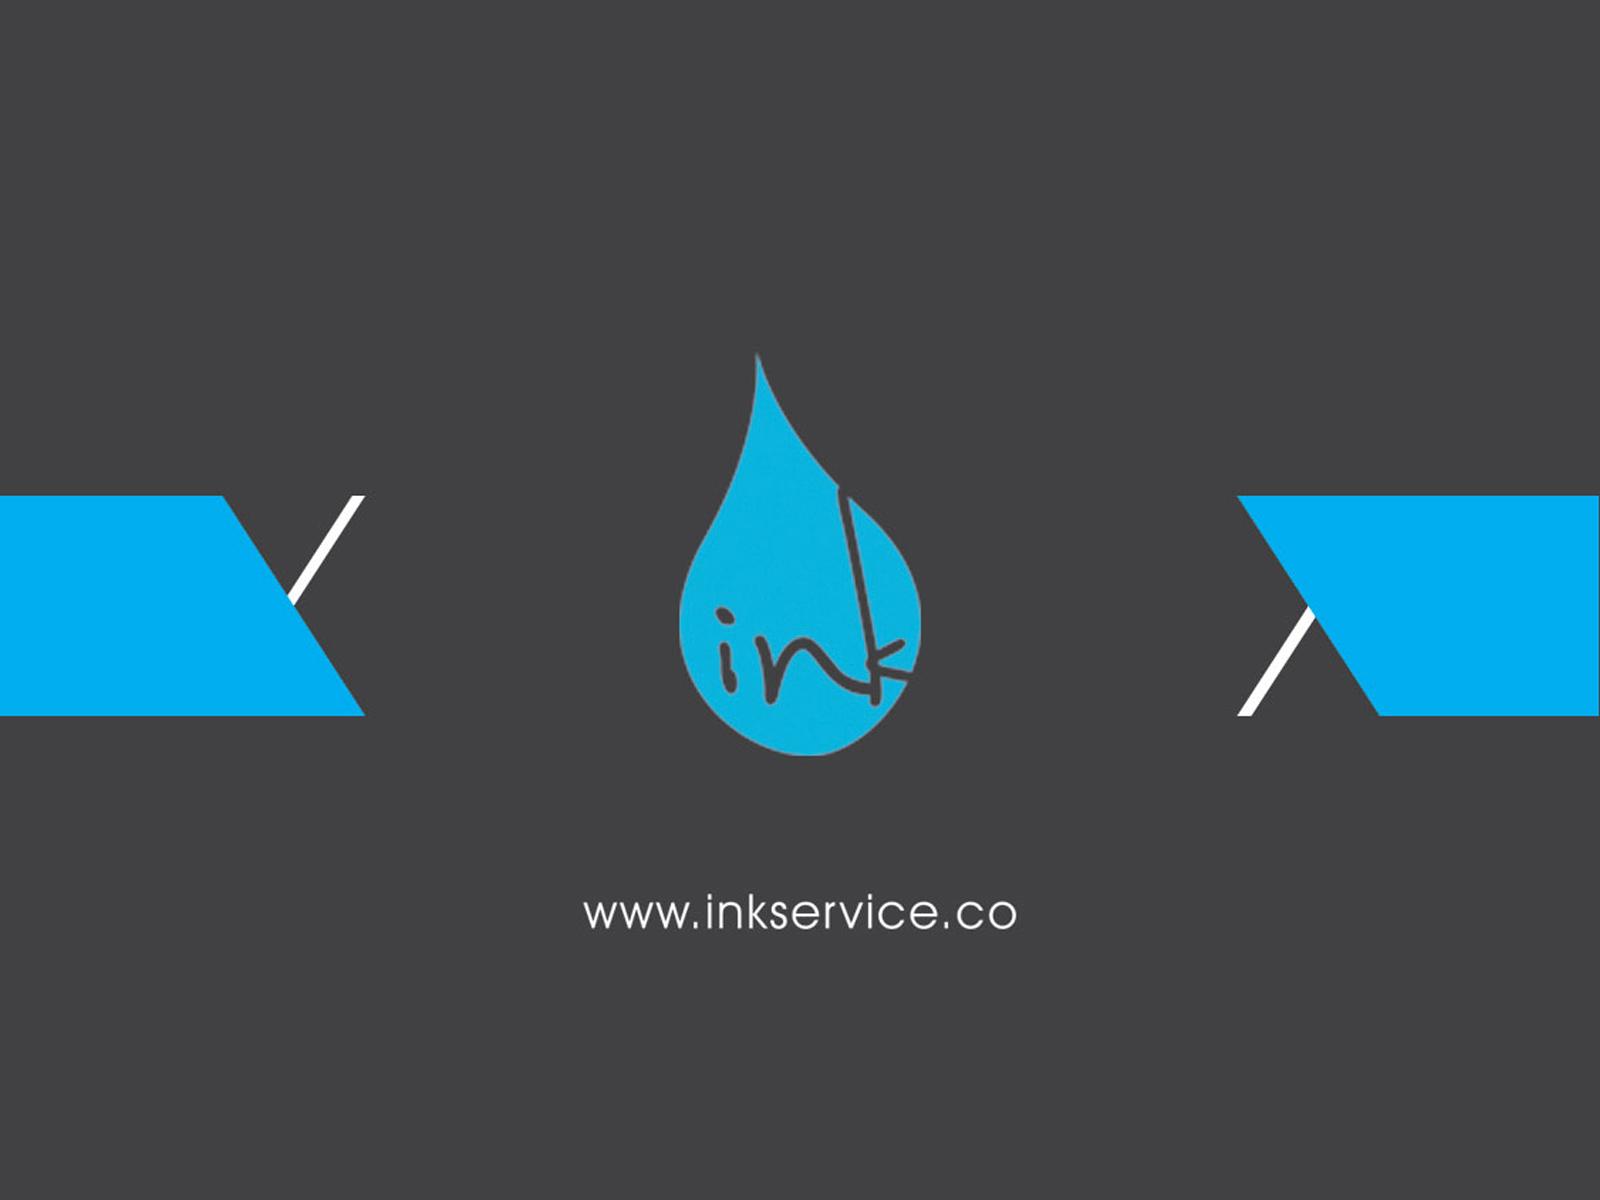 businesscard_01_inkservice_kuwait